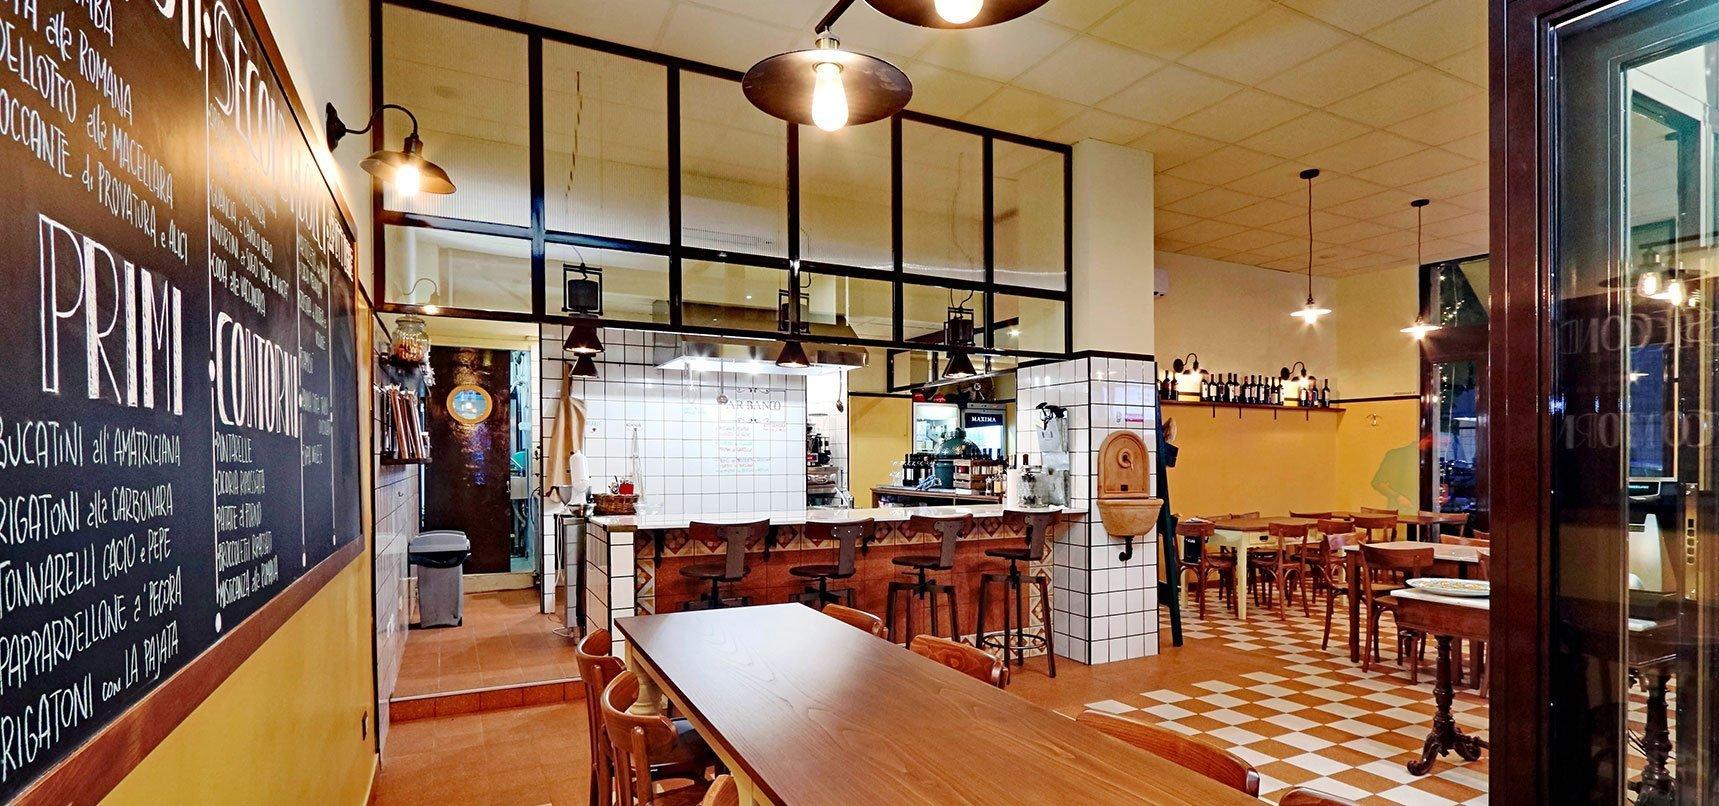 arredamento locali pubblici bar, ristoranti, caffetterie, panifici, paninoteche, pizzerie, cocktail bar, wine bar, enoteche, street food